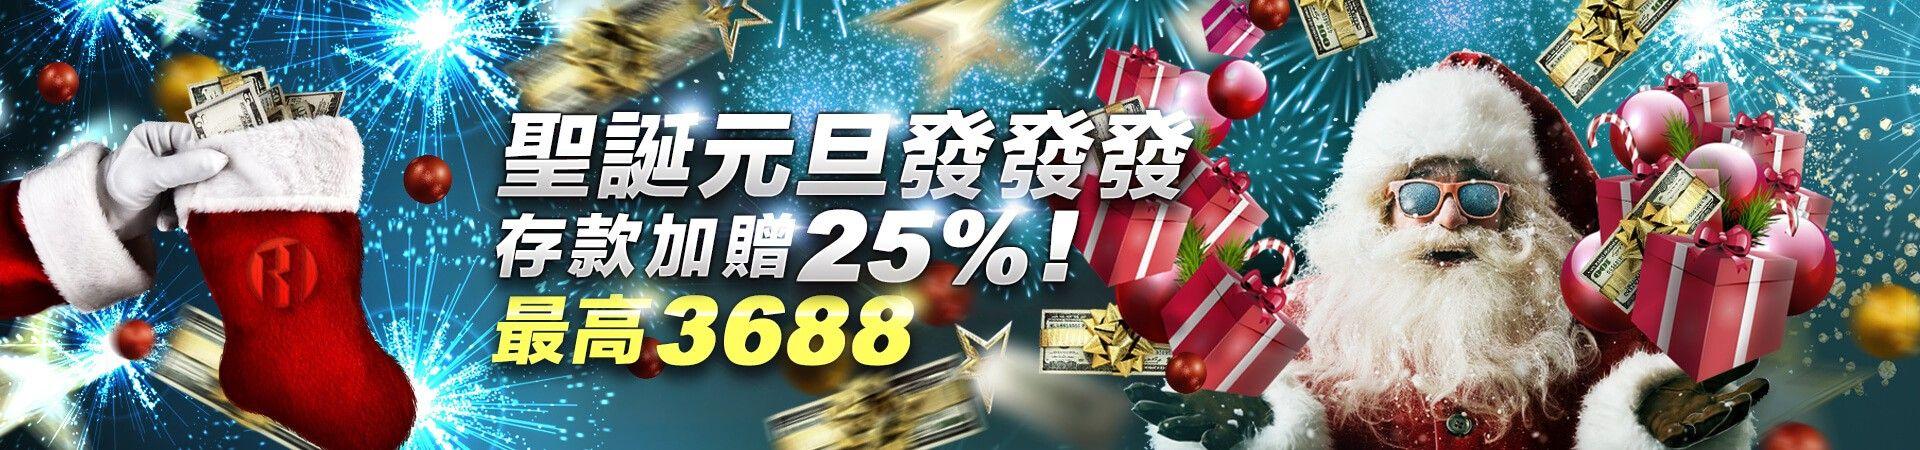 HOYA娛樂城元旦聖誕活動-存款加贈25%!最高送你3688!讓你發發發